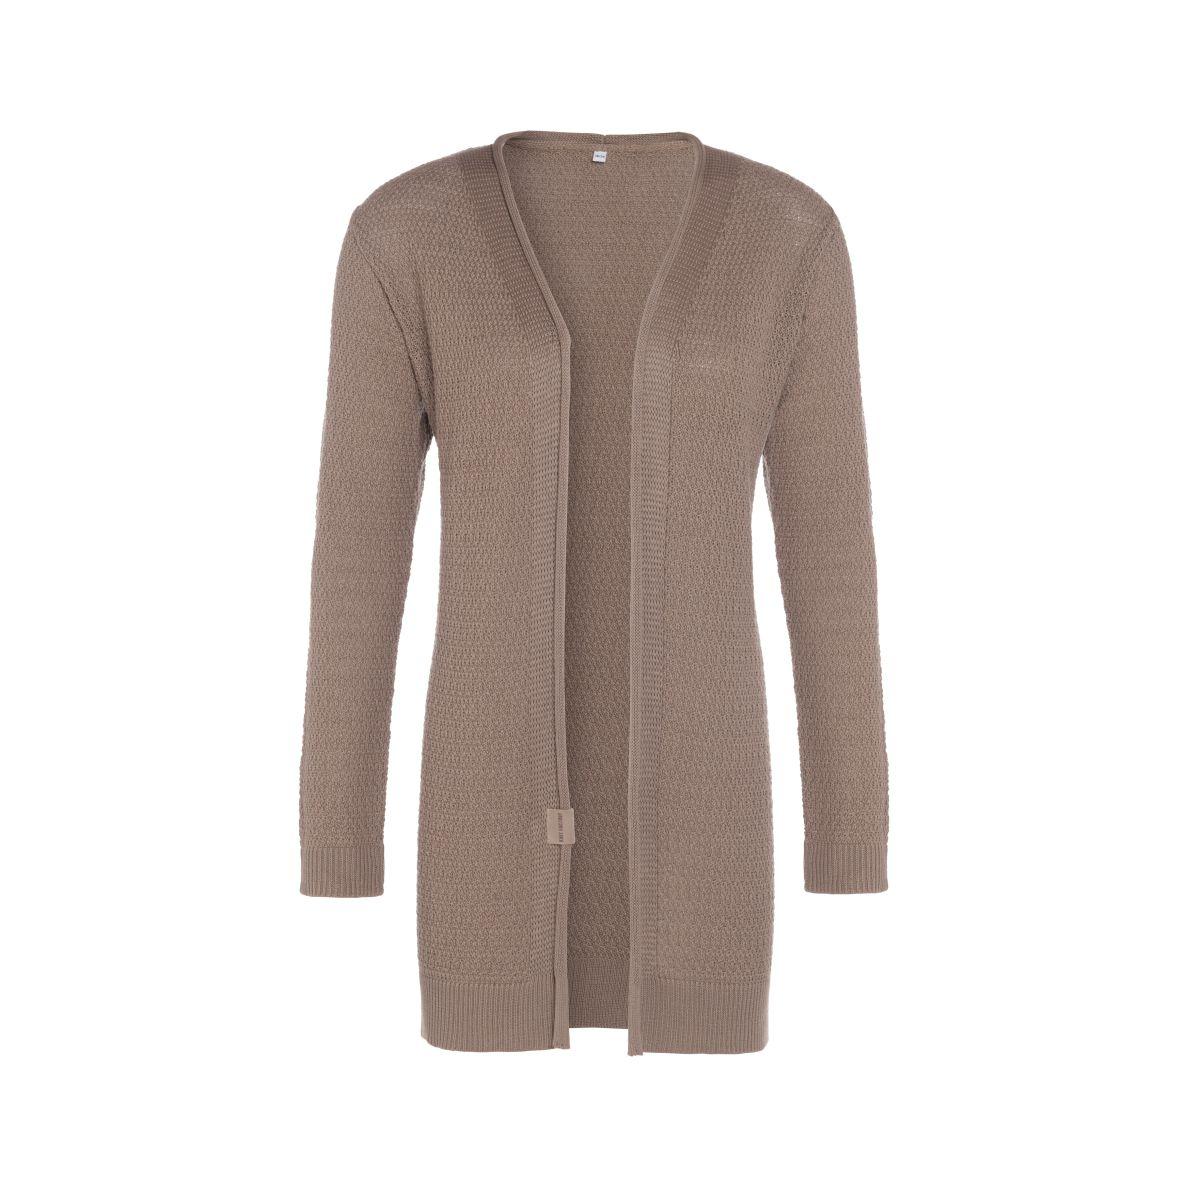 knit factory 1416220 june vest 3638 new camel 1